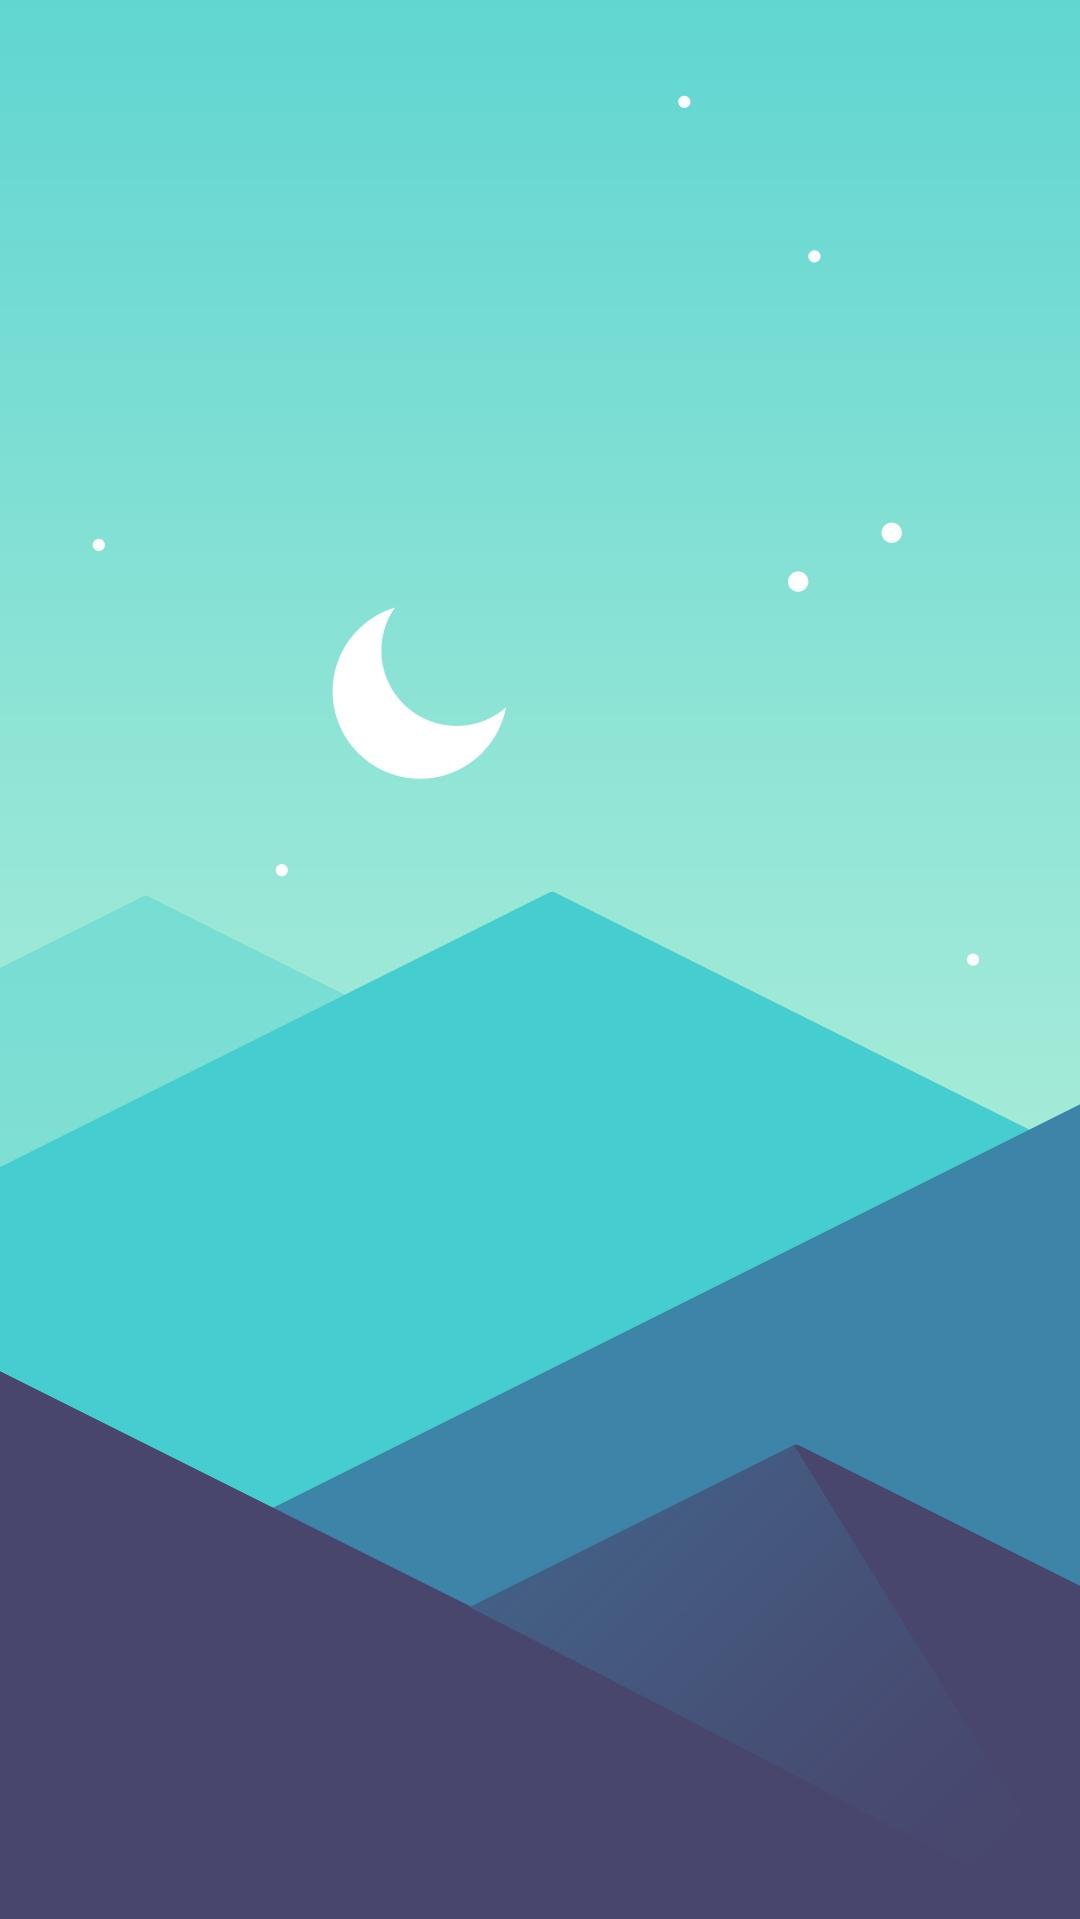 Cute Hulk Wallpaper Minimal Mountains Moon Iphone Wallpaper Iphone Wallpapers